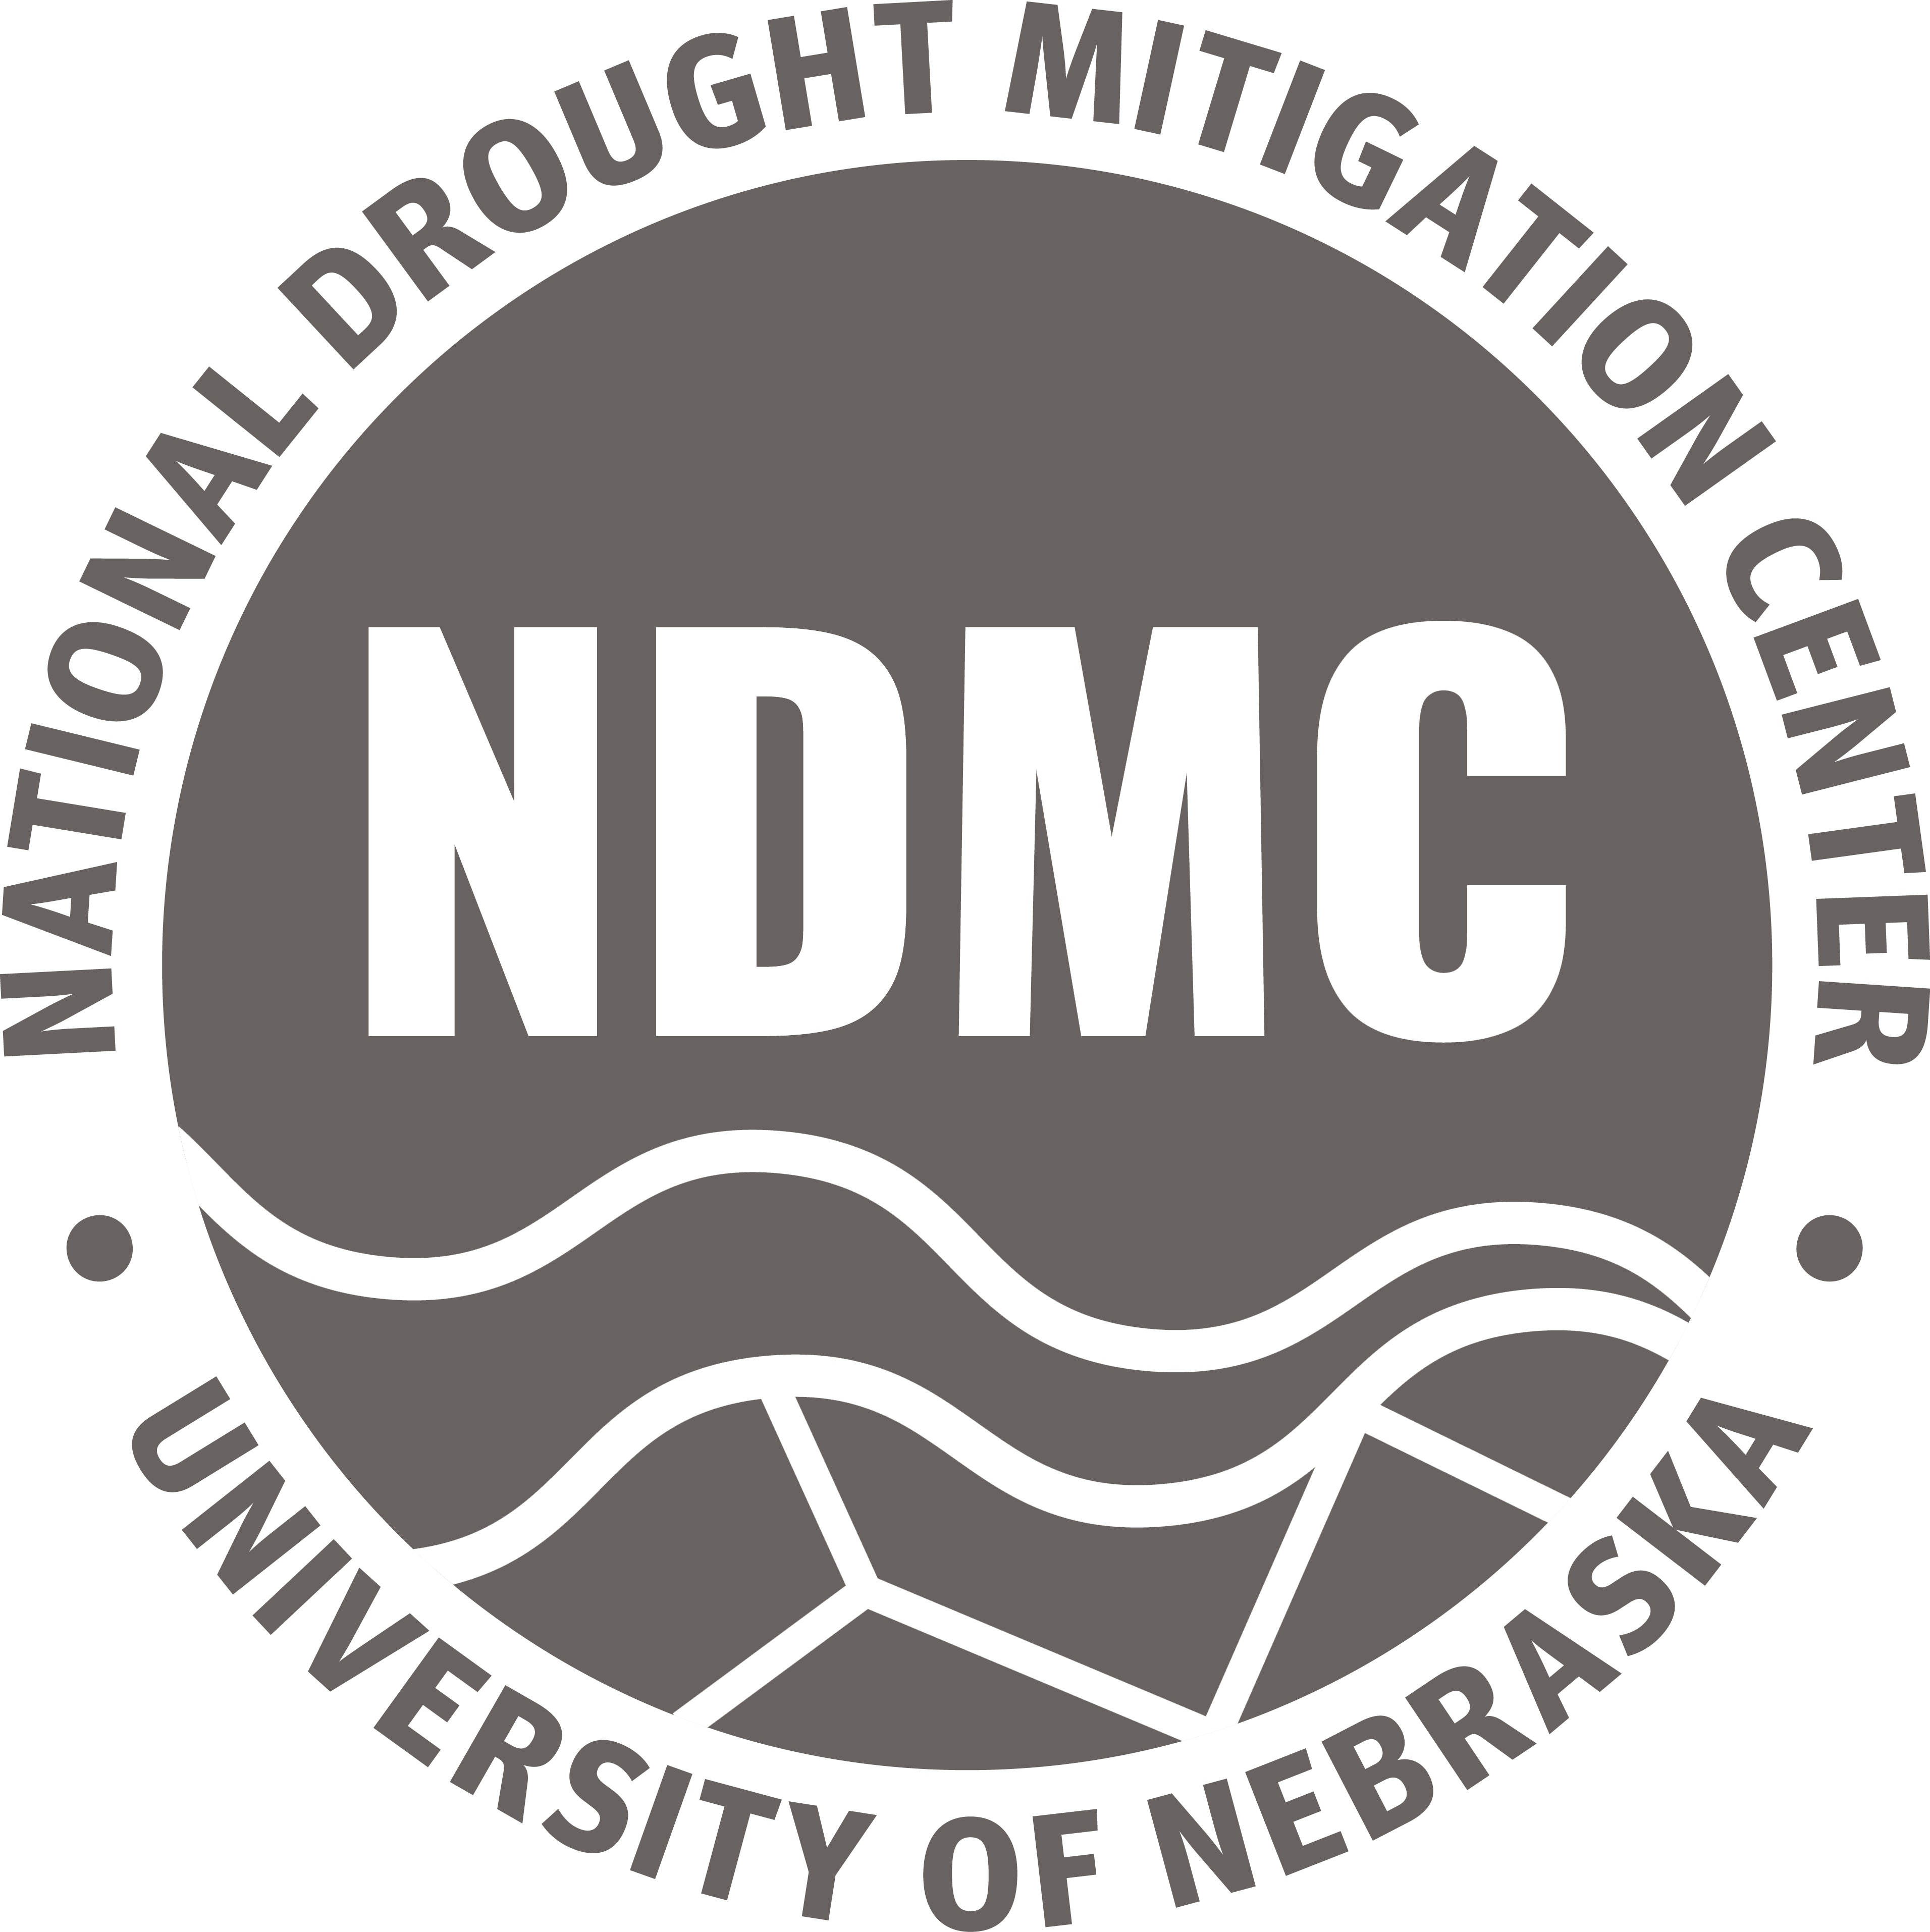 National Drought Mitigation Center